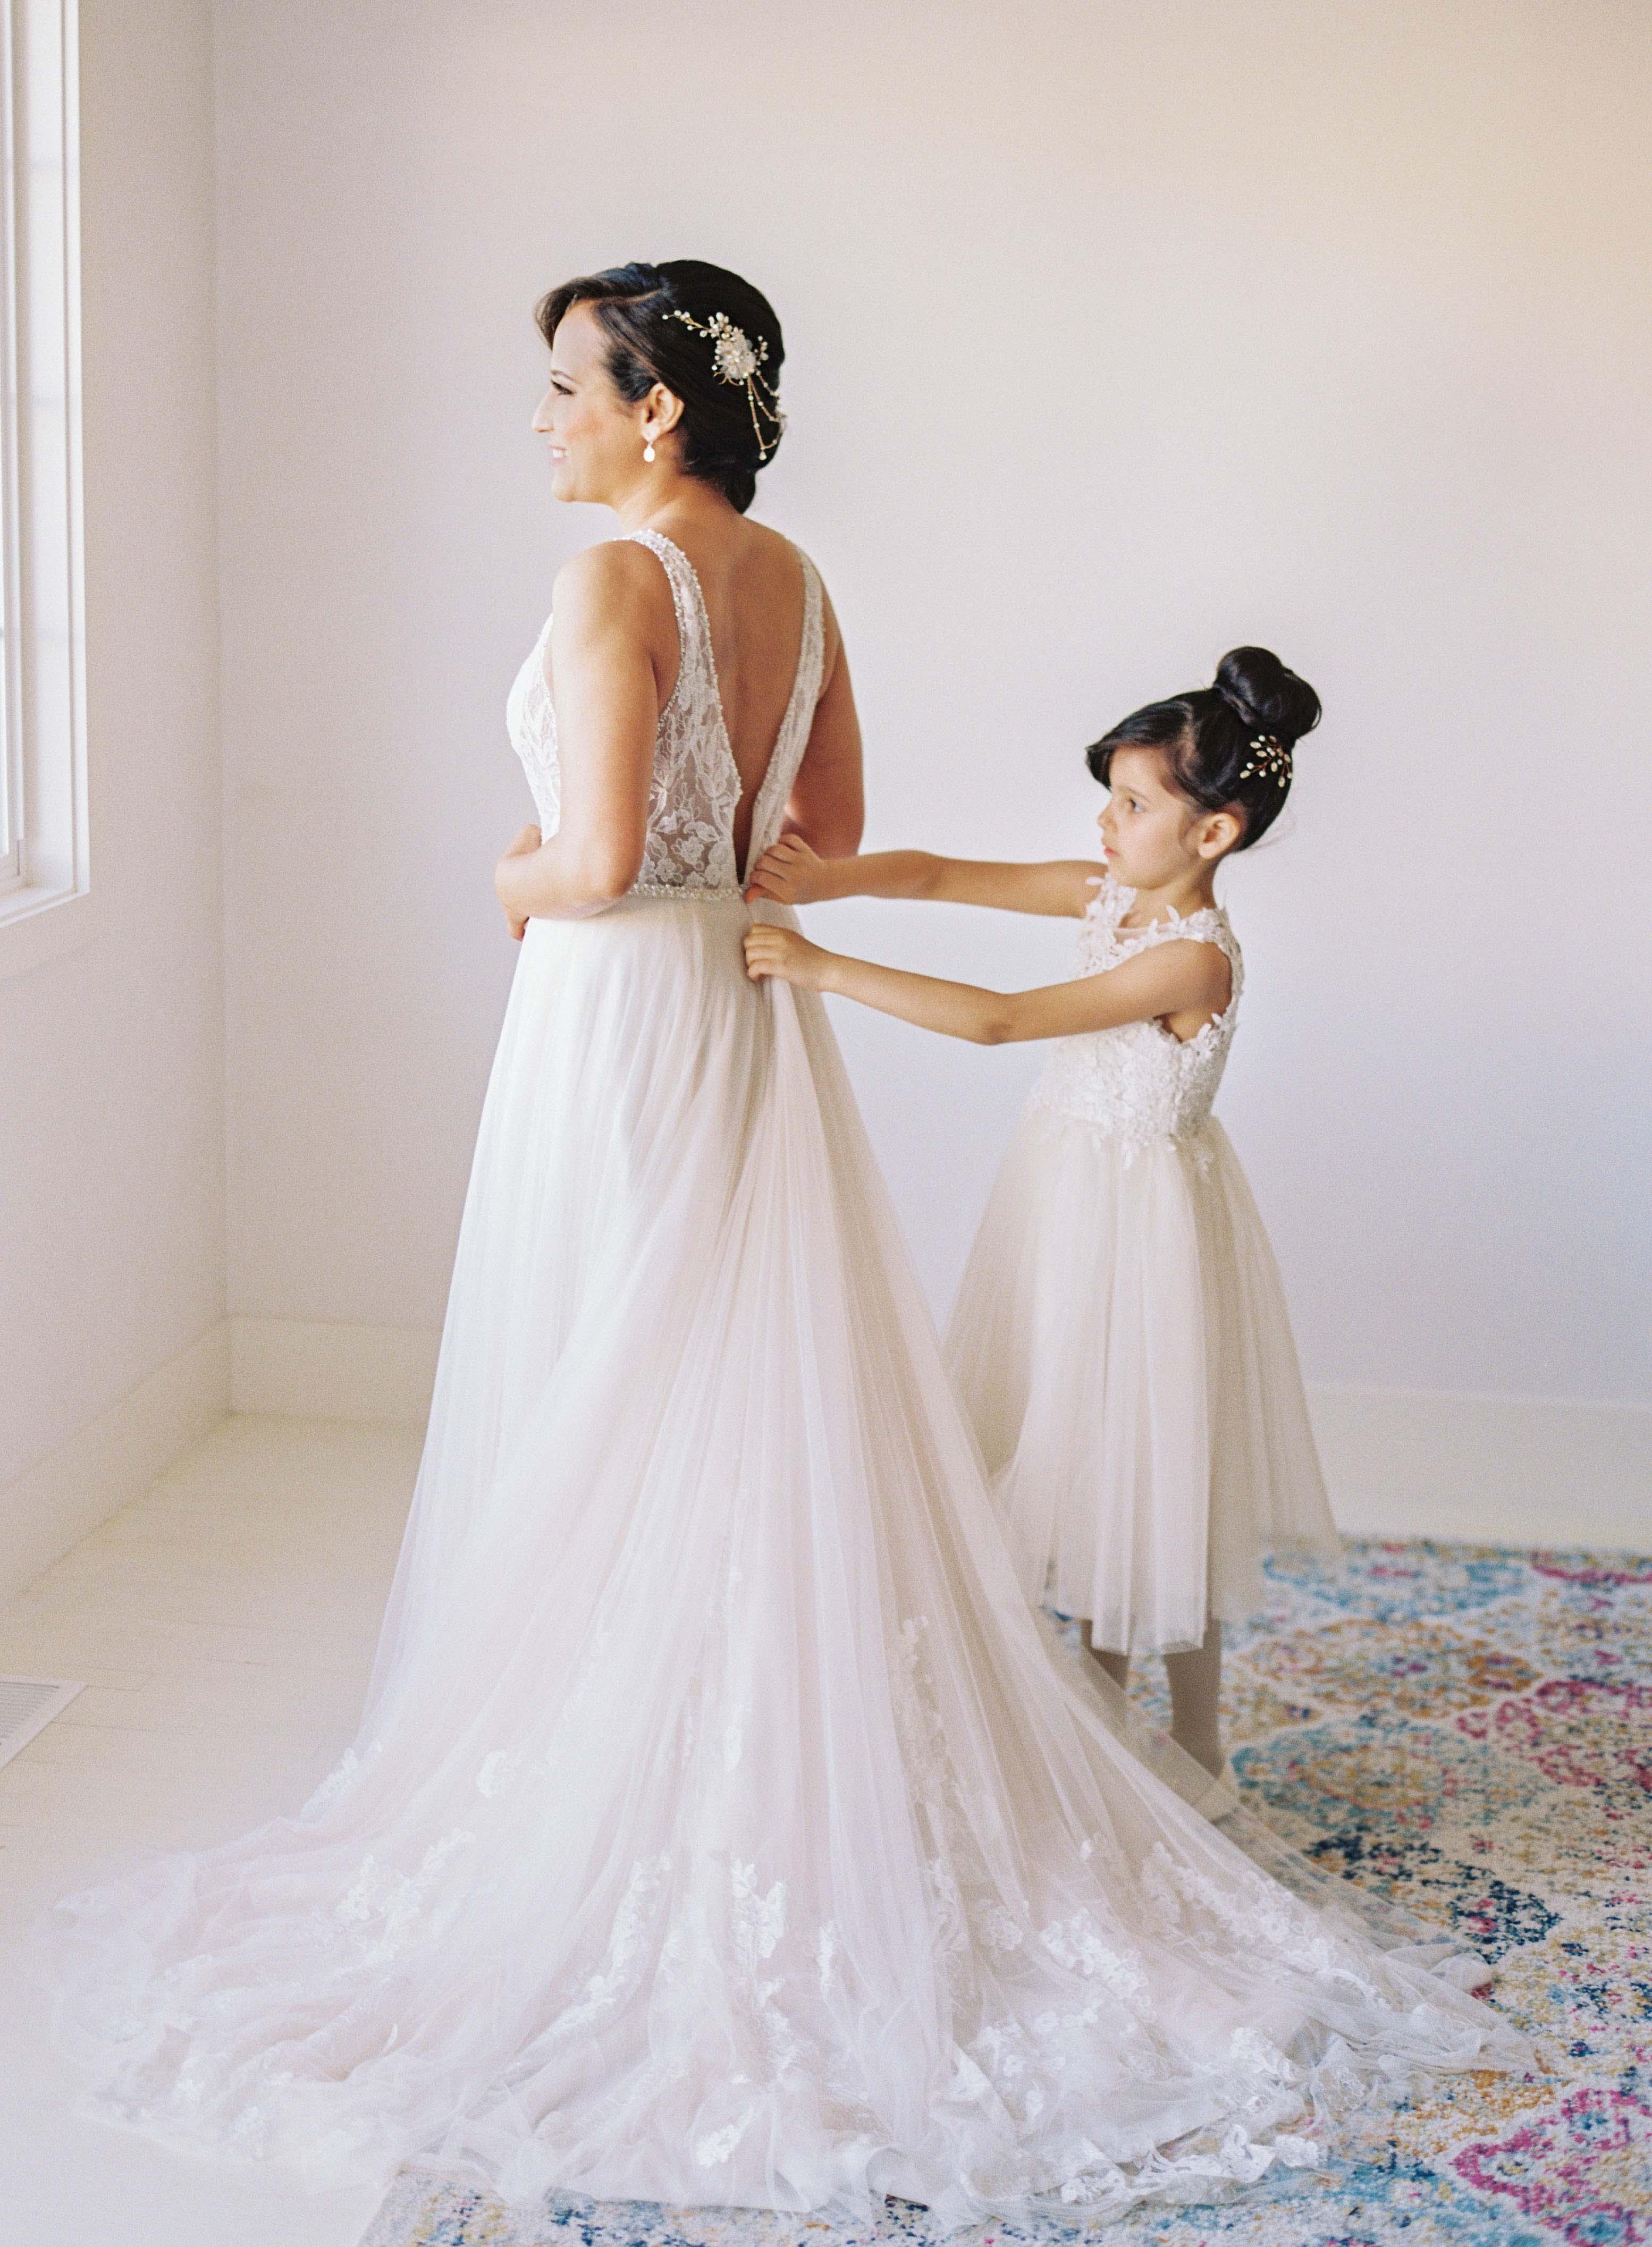 girl helps bride wearing wedding dress